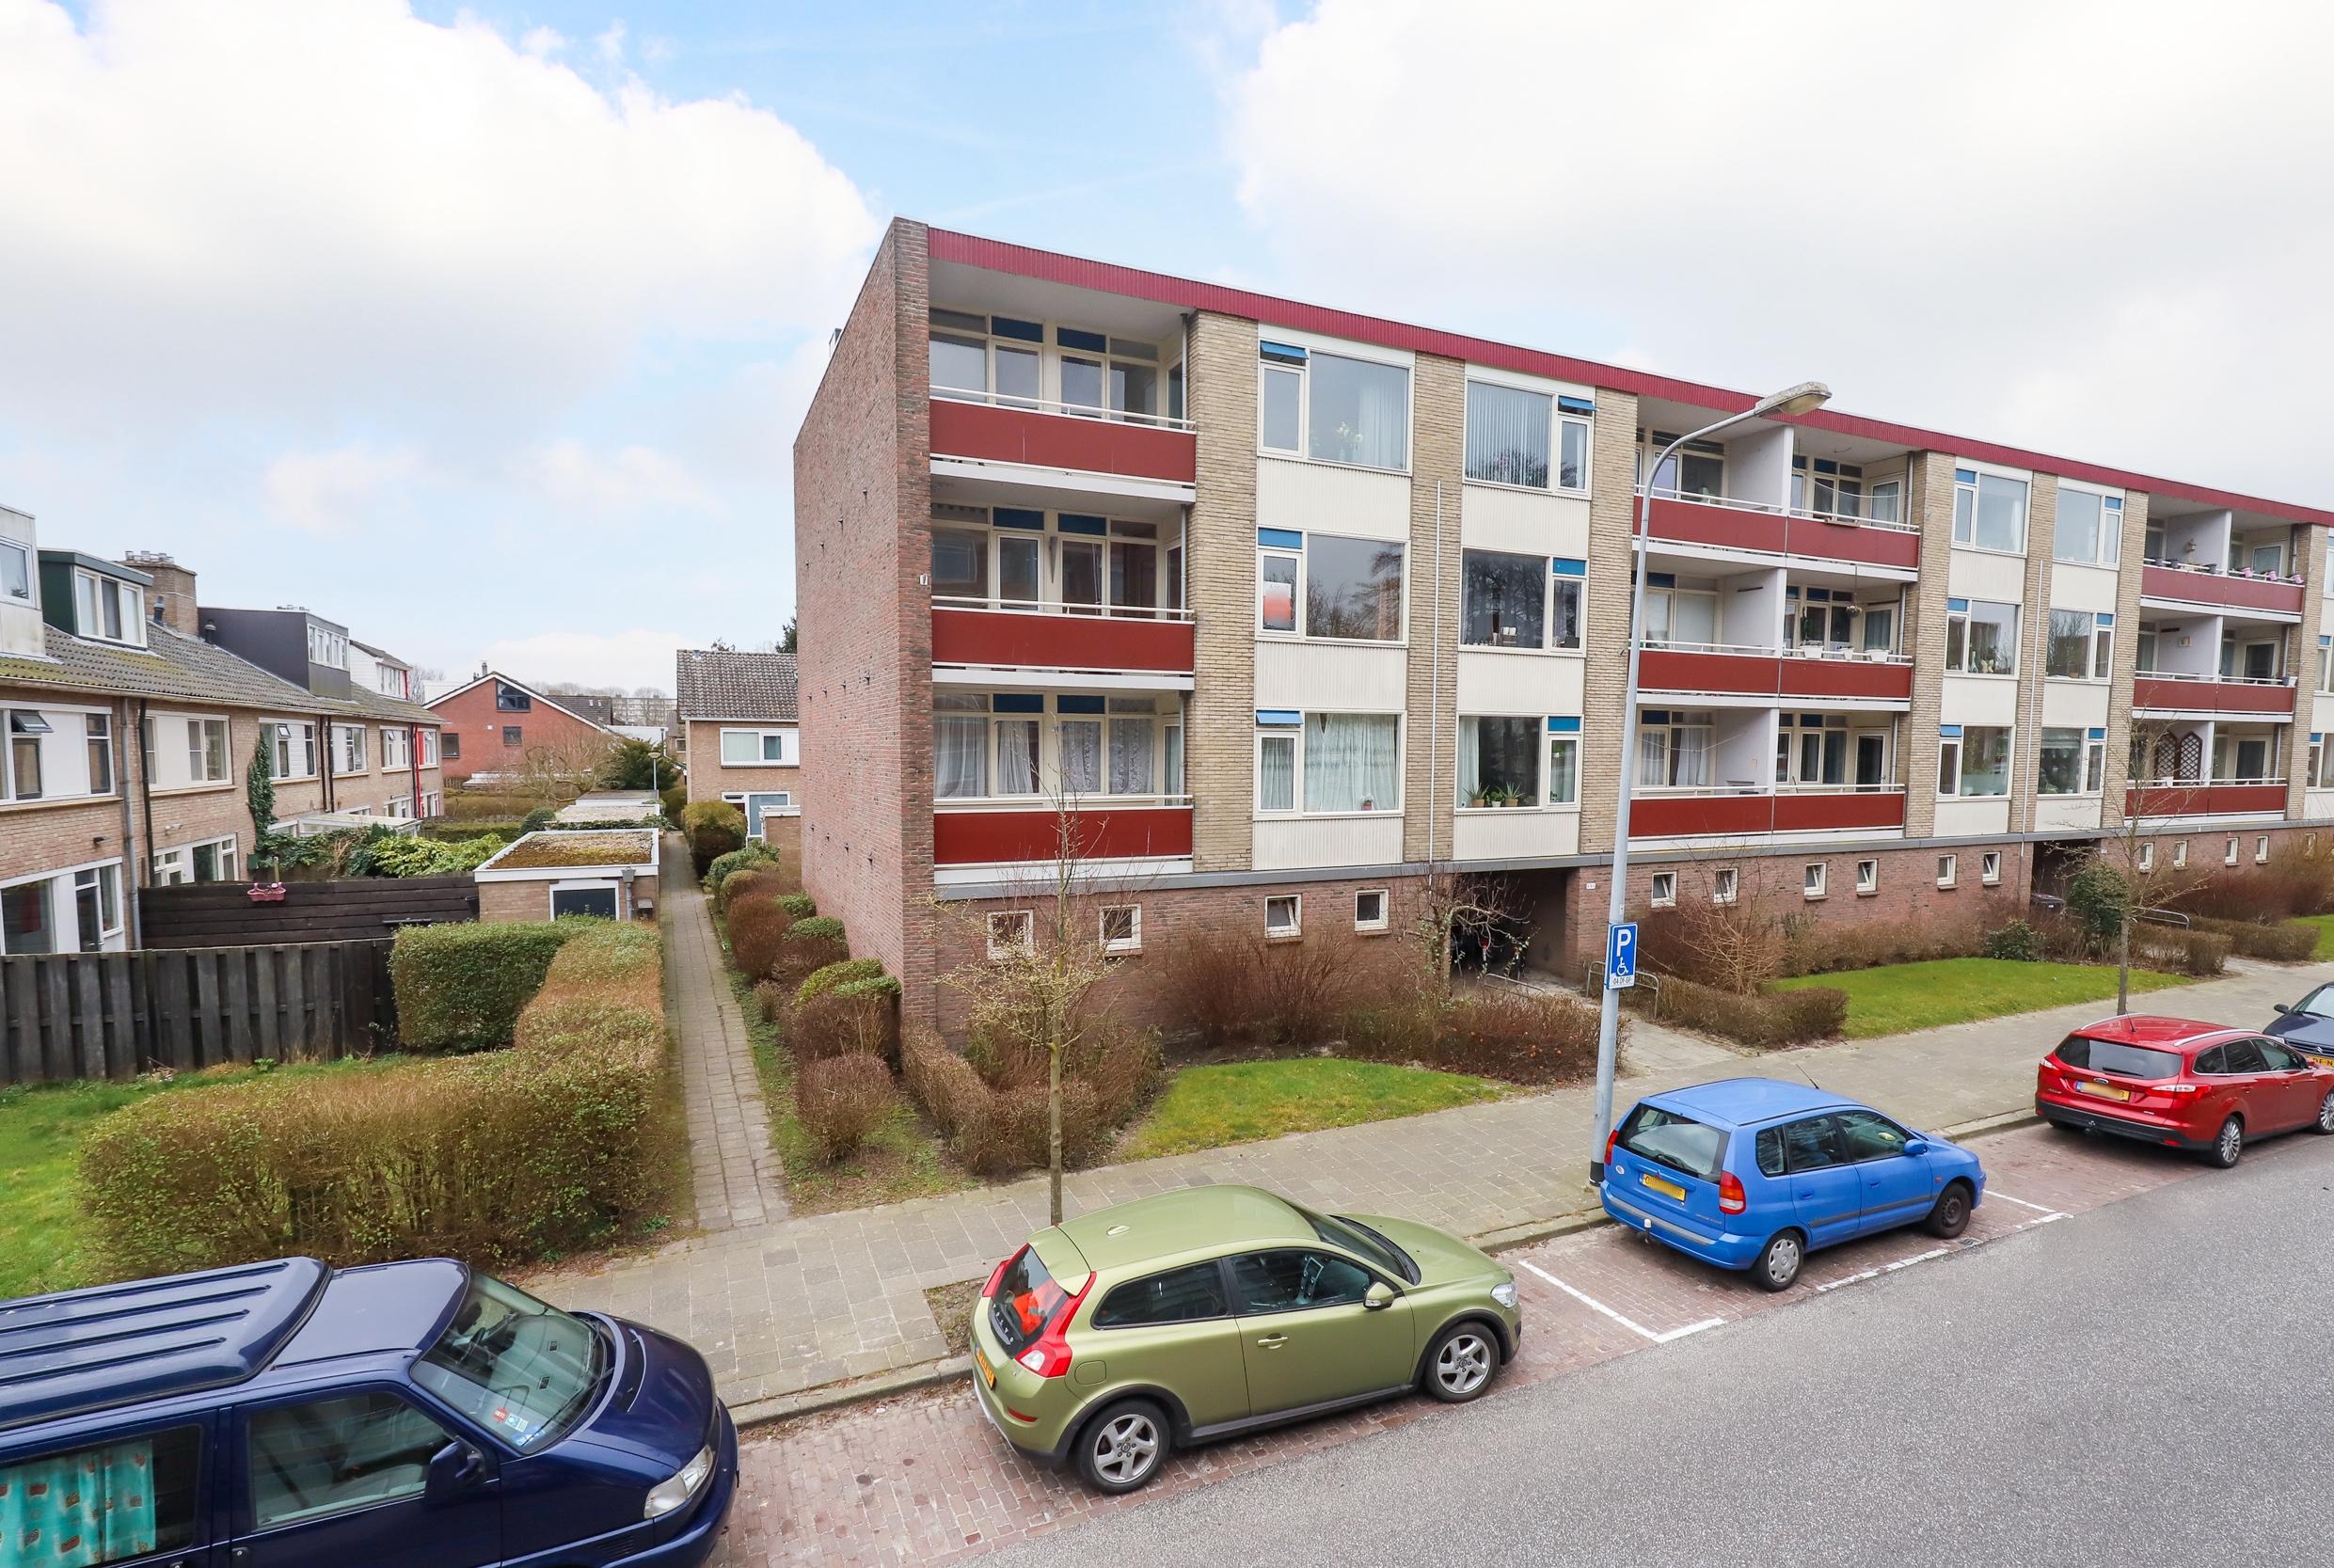 Plutolaan 70 Groningen - Portiekflat met 3 slaapkamers in Paddepoel